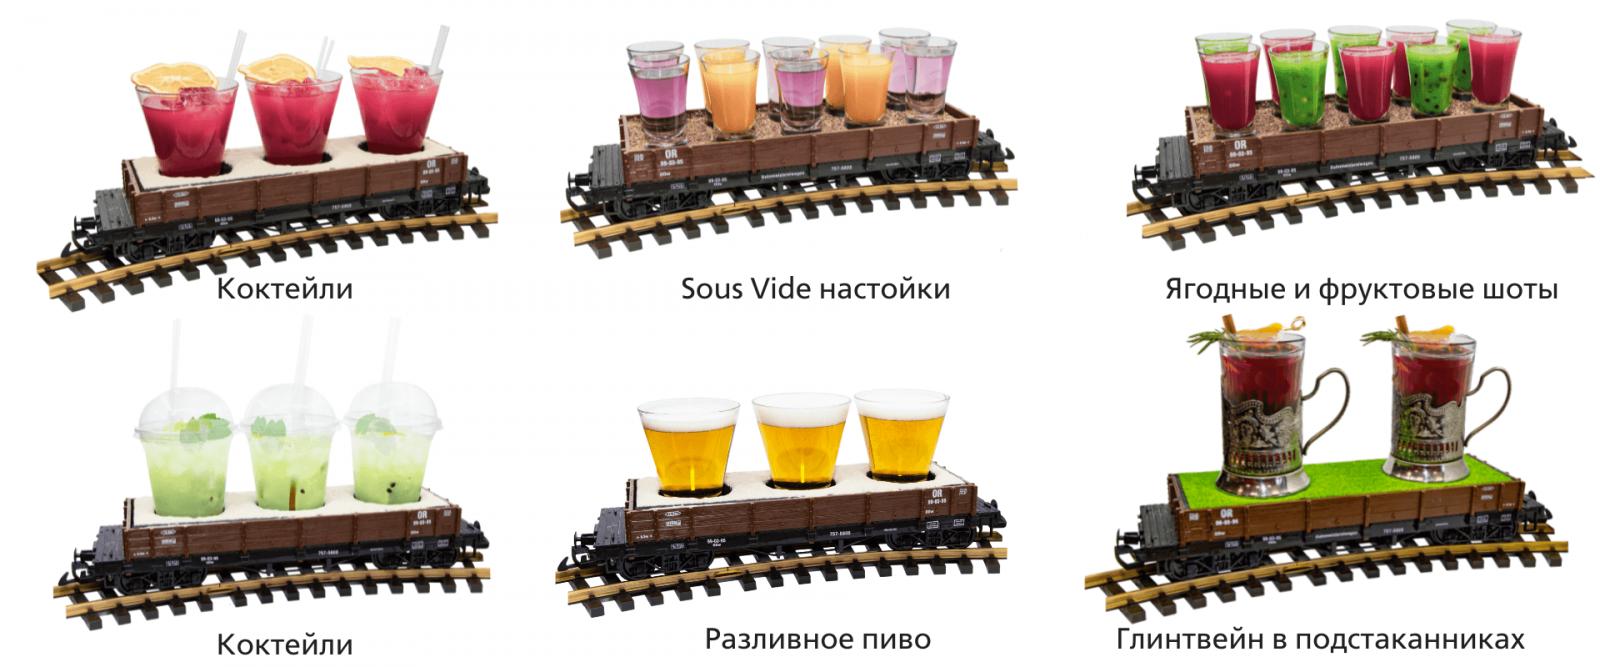 Коктейли в Железнодорожном баре